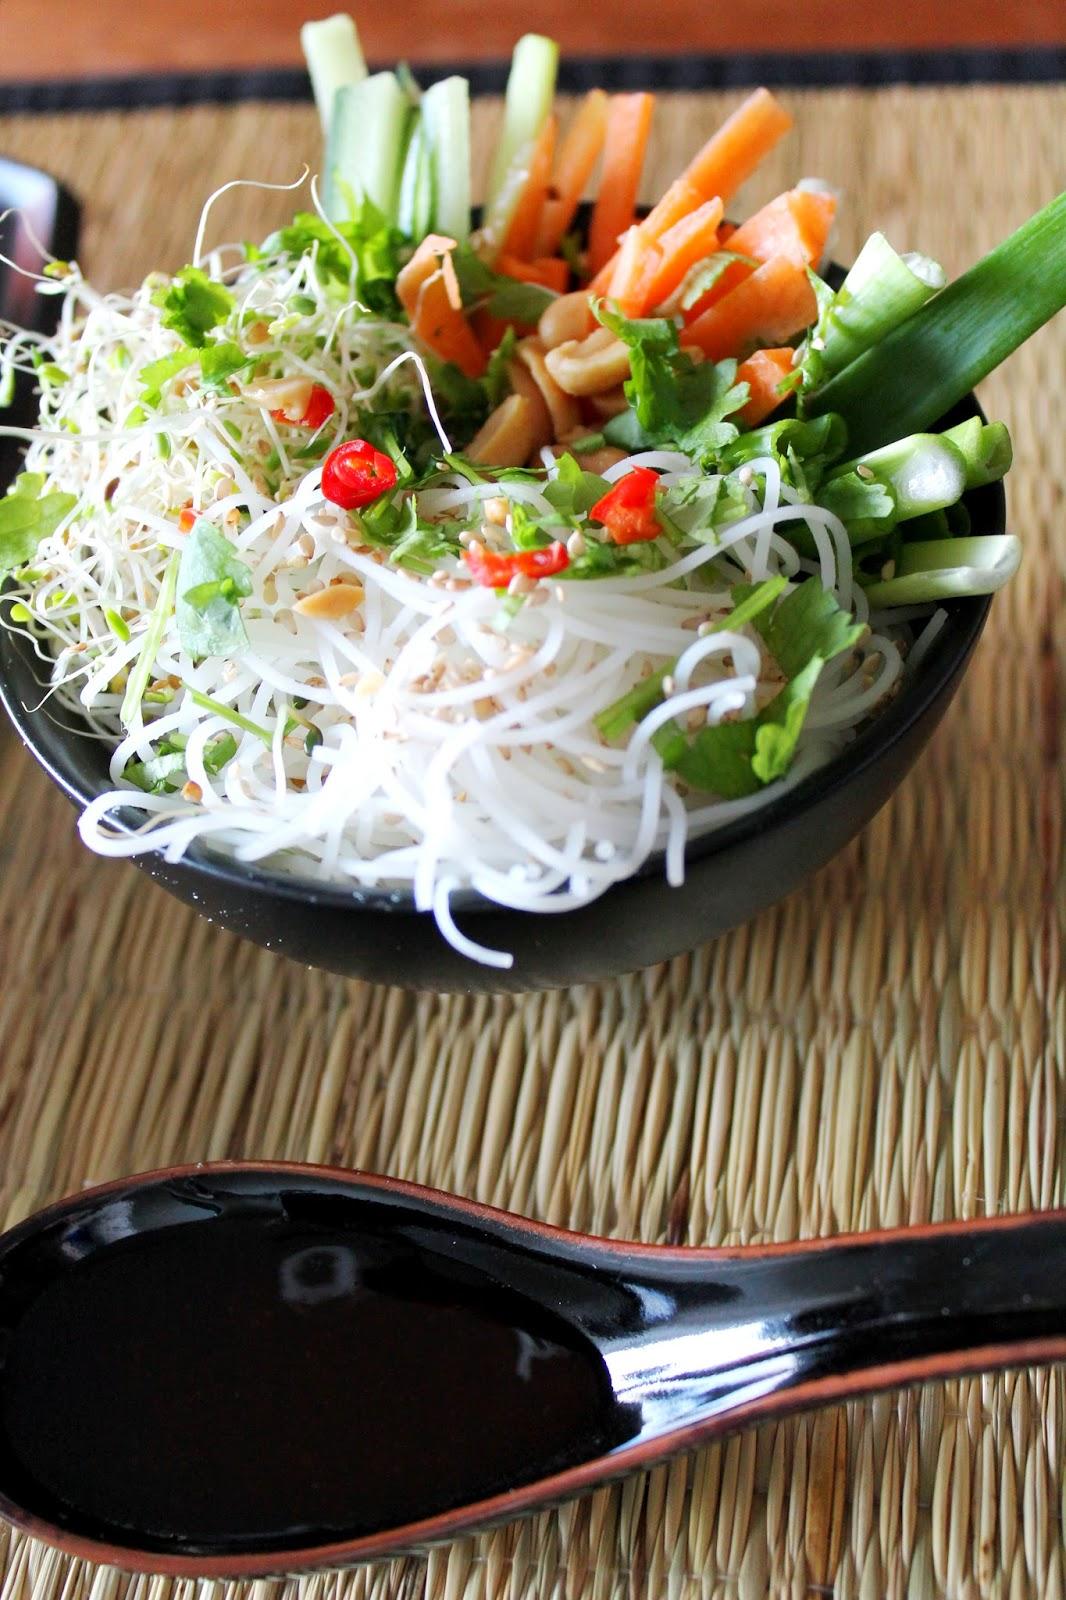 Vermicelli noodles   Alinan kotona blog #asian #vermicelli #noodled #cupnoodles